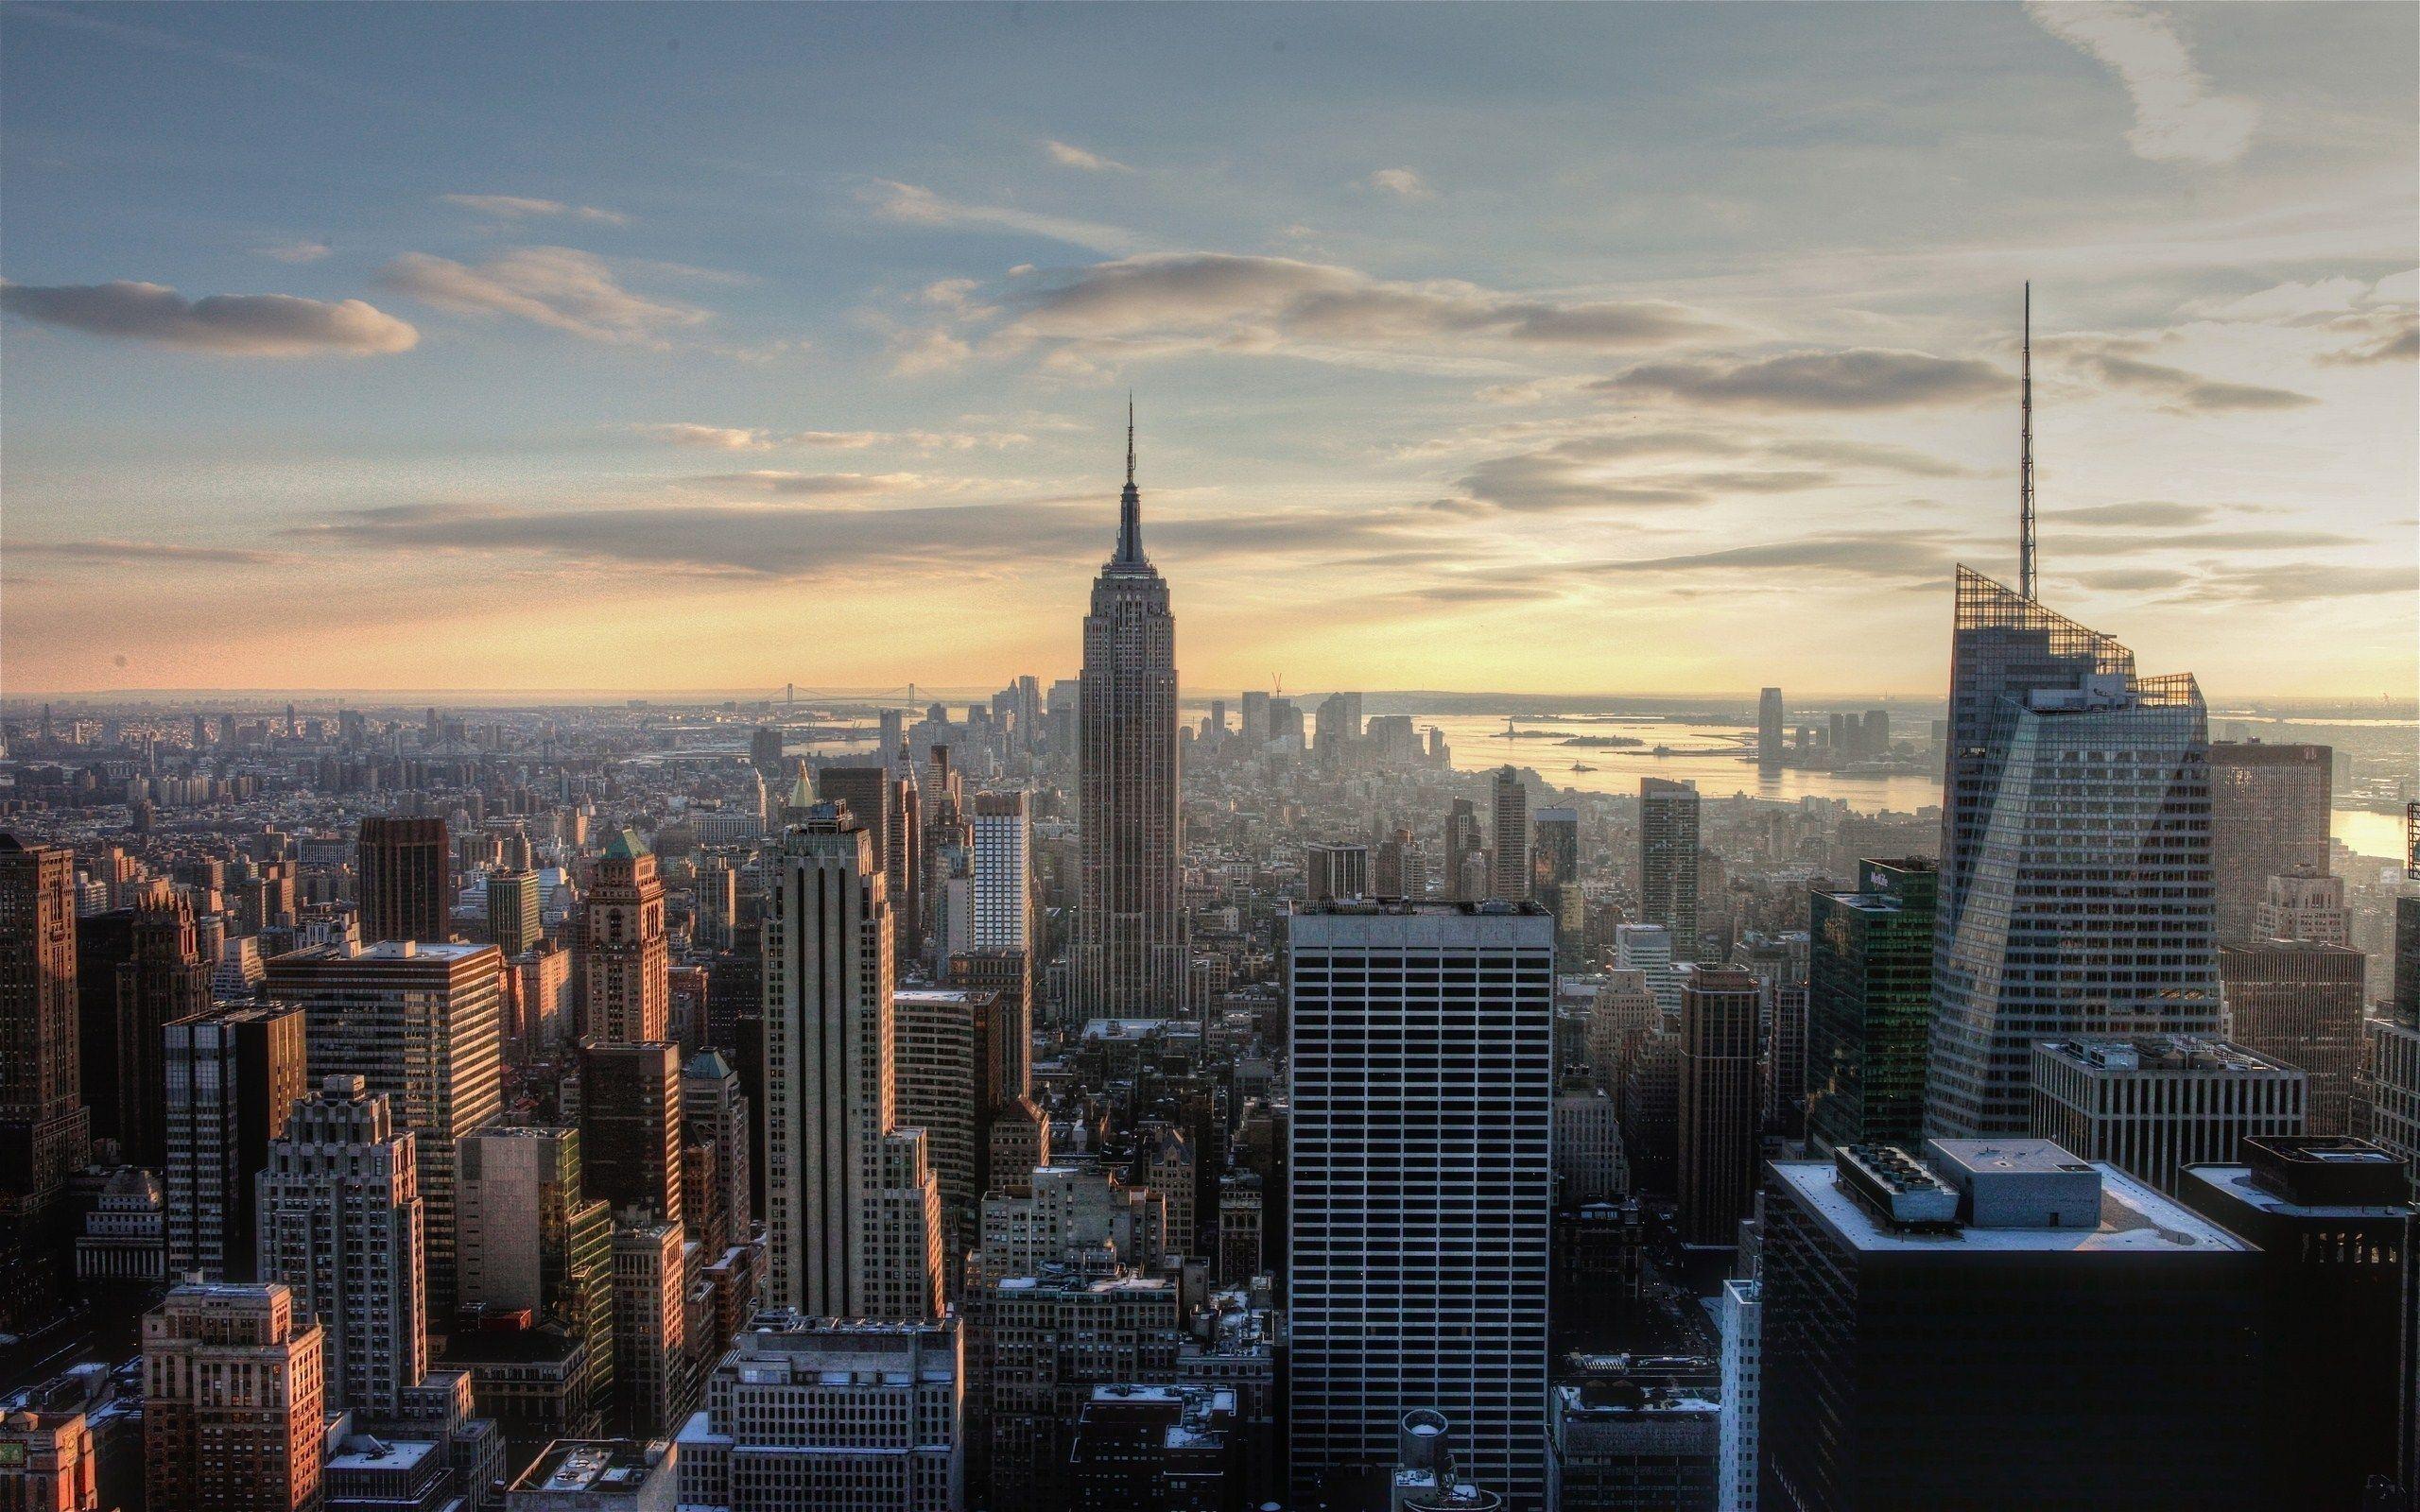 10 Best New York City Desktop Wallpaper Hd Full Hd 1920 1080 For Pc Background New York Wallpaper Macbook Pro Wallpaper City Wallpaper